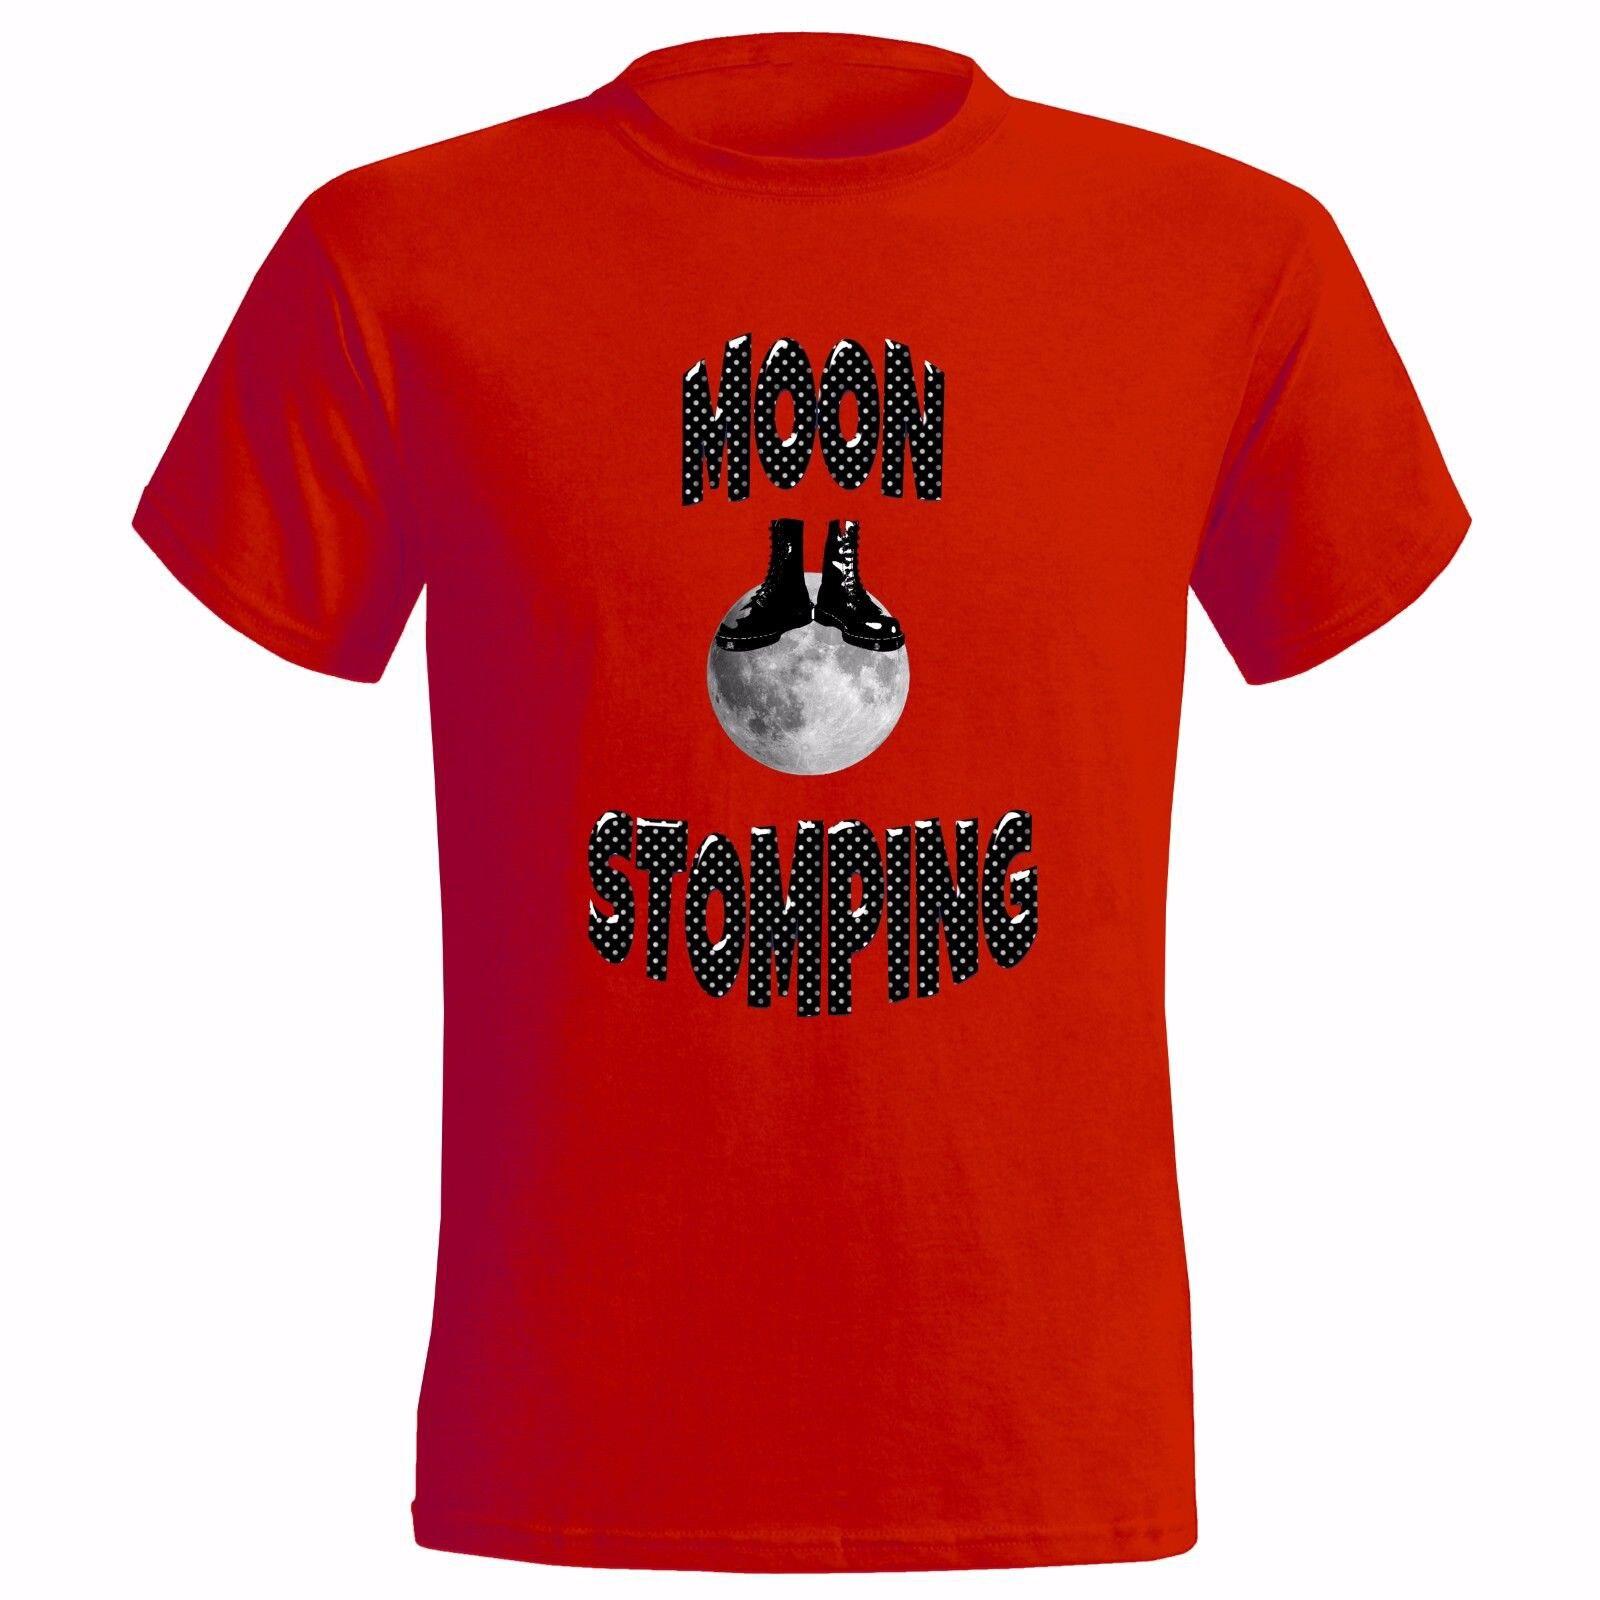 Moon Stomping Design Mens T Shirt Skinhead Ska Reggae Specials Two